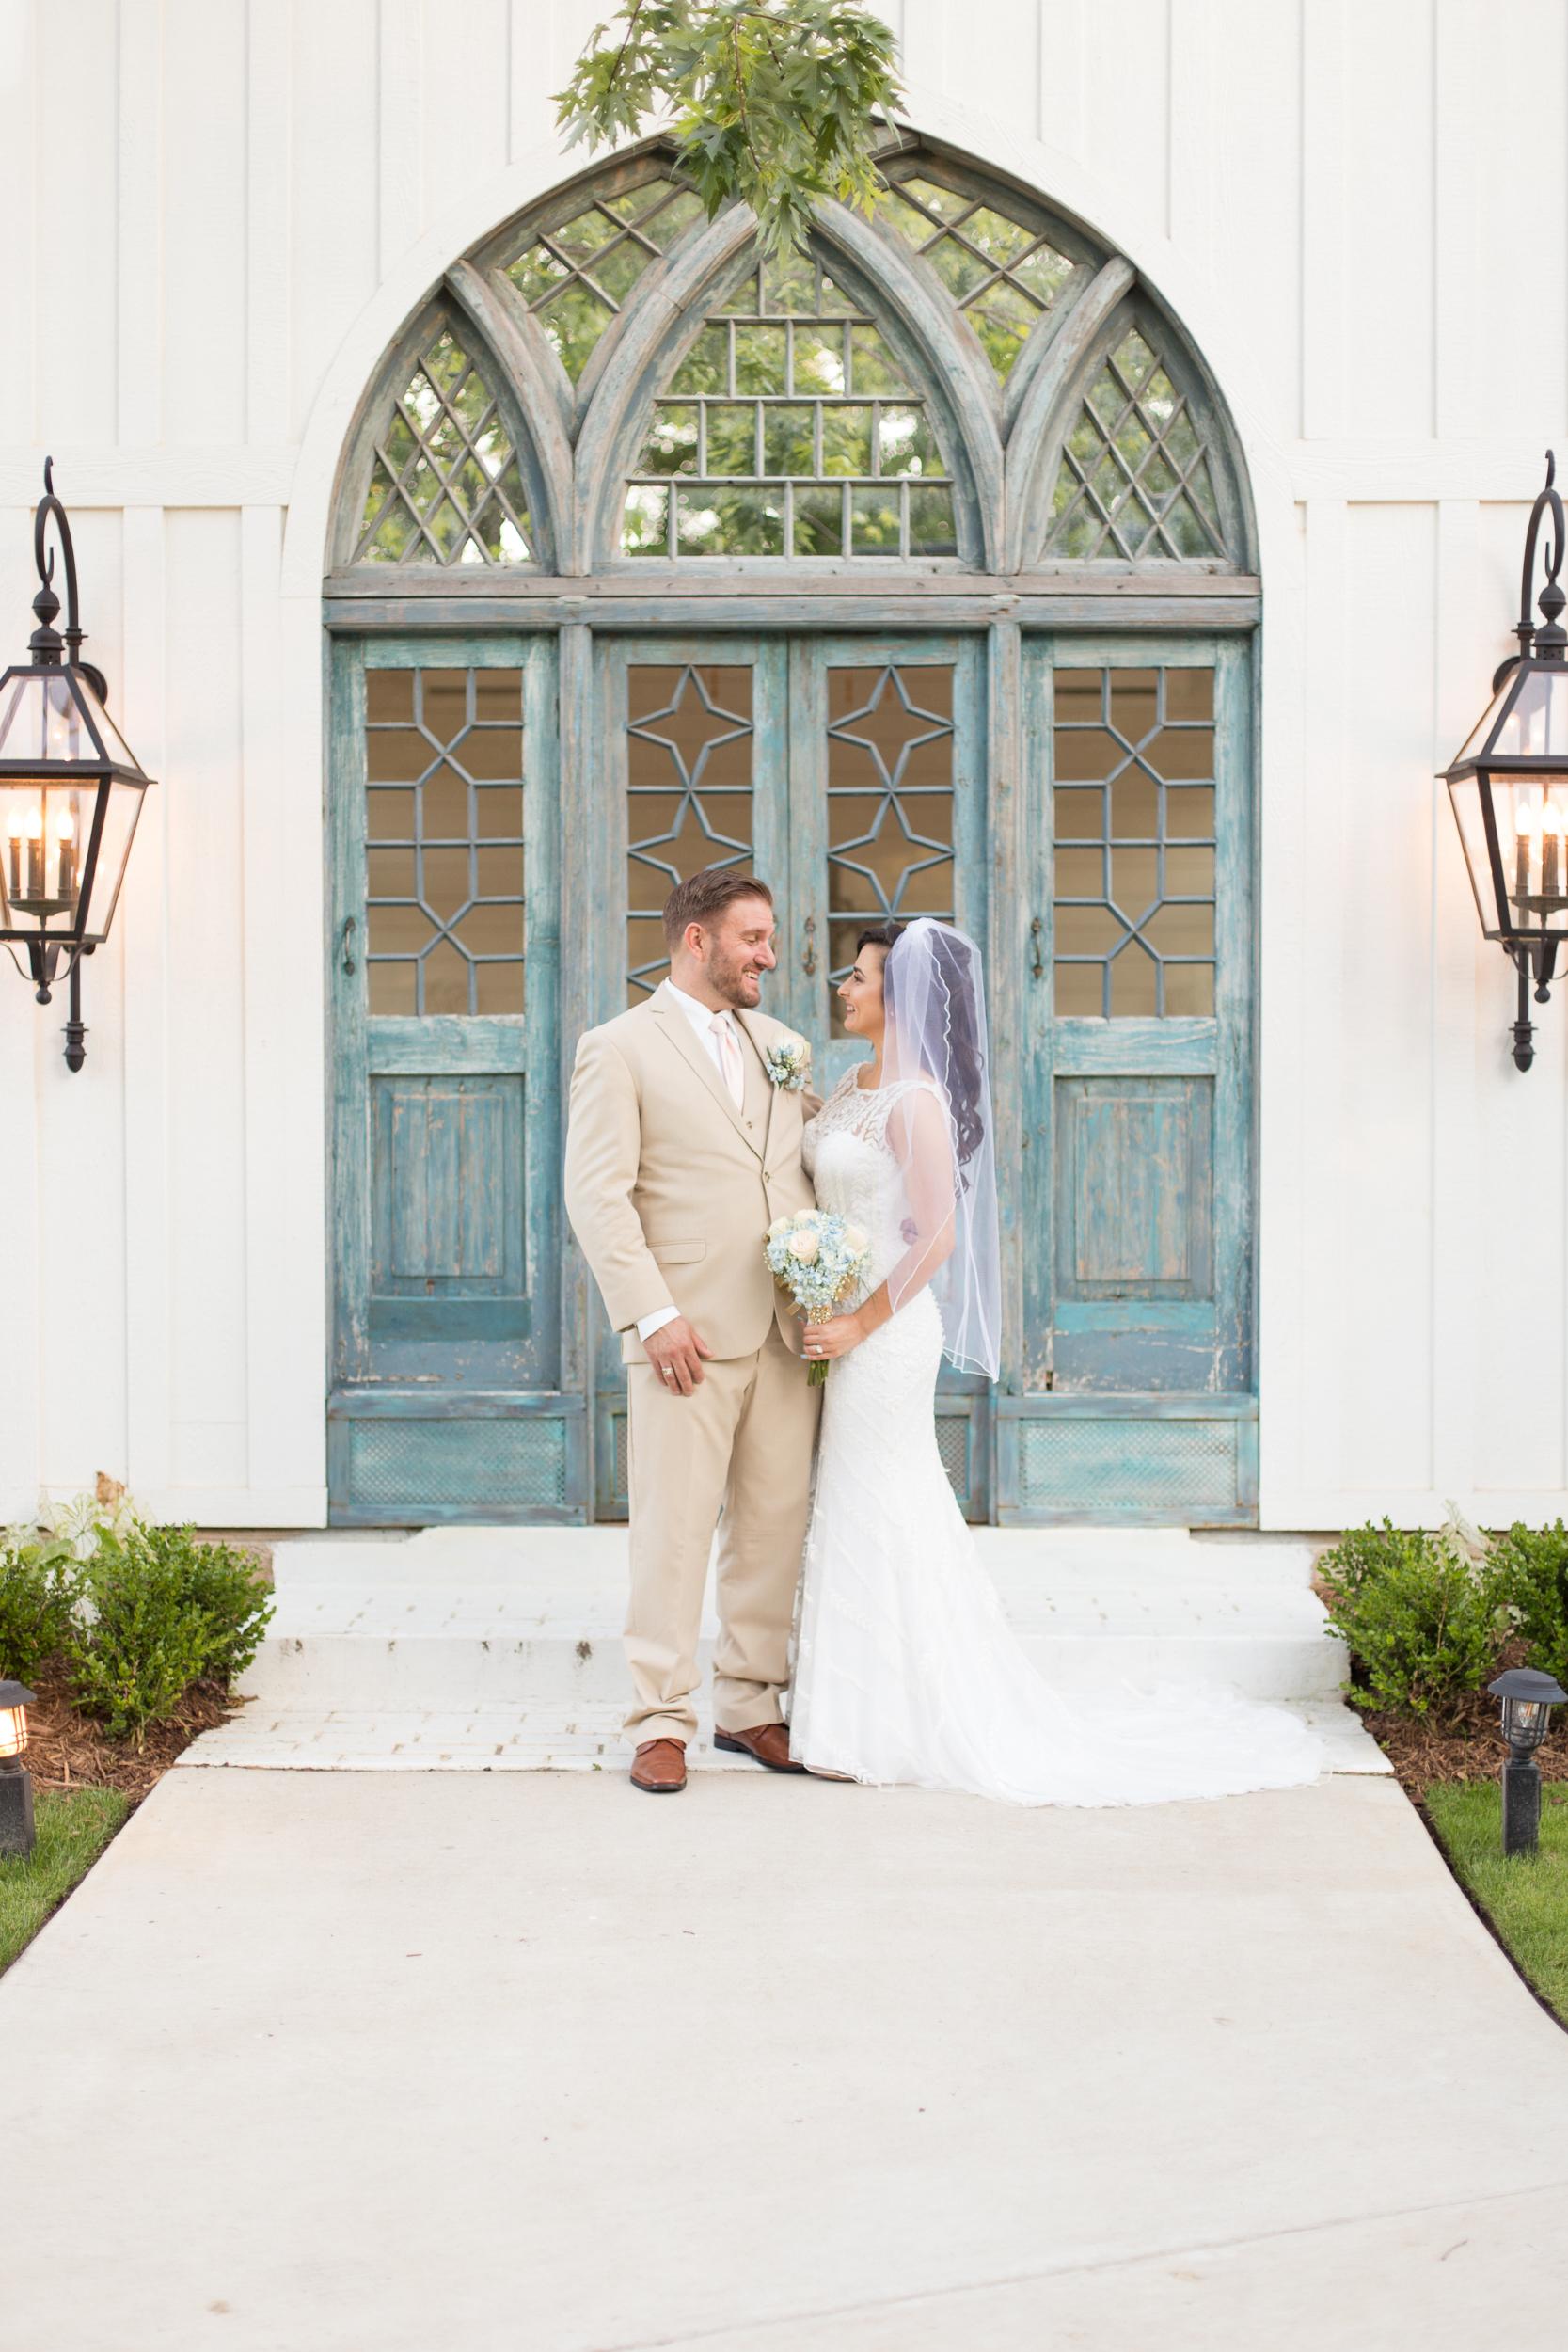 Zihlman-East TX Wedding_Kelsie Hendricks Photography_The Folmar Tyler Texas-114.jpg